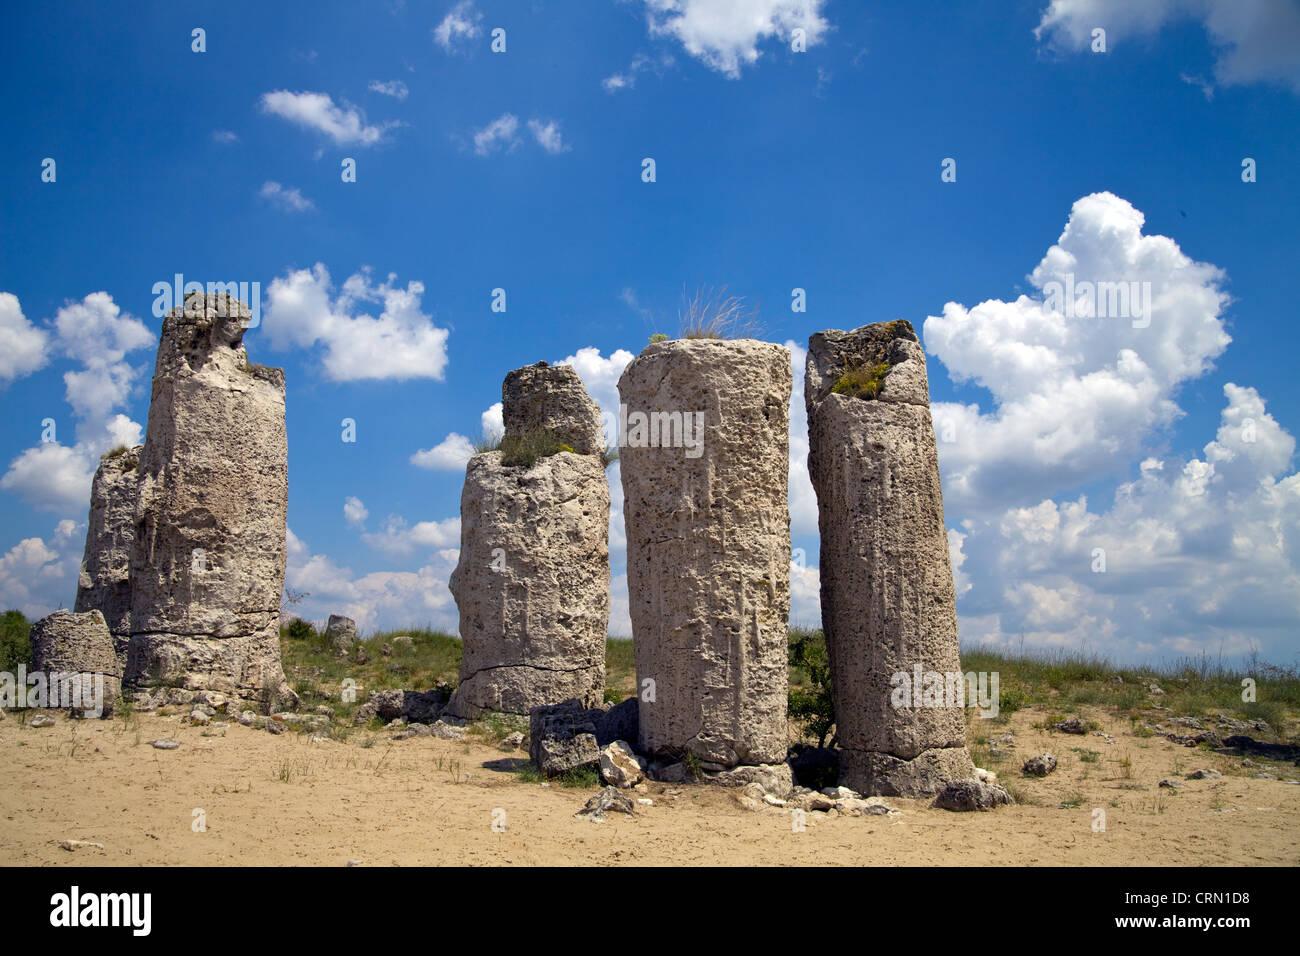 Pobiti Kamani petrified Stone Forest Near Varna in Bulgaria Stock Photo